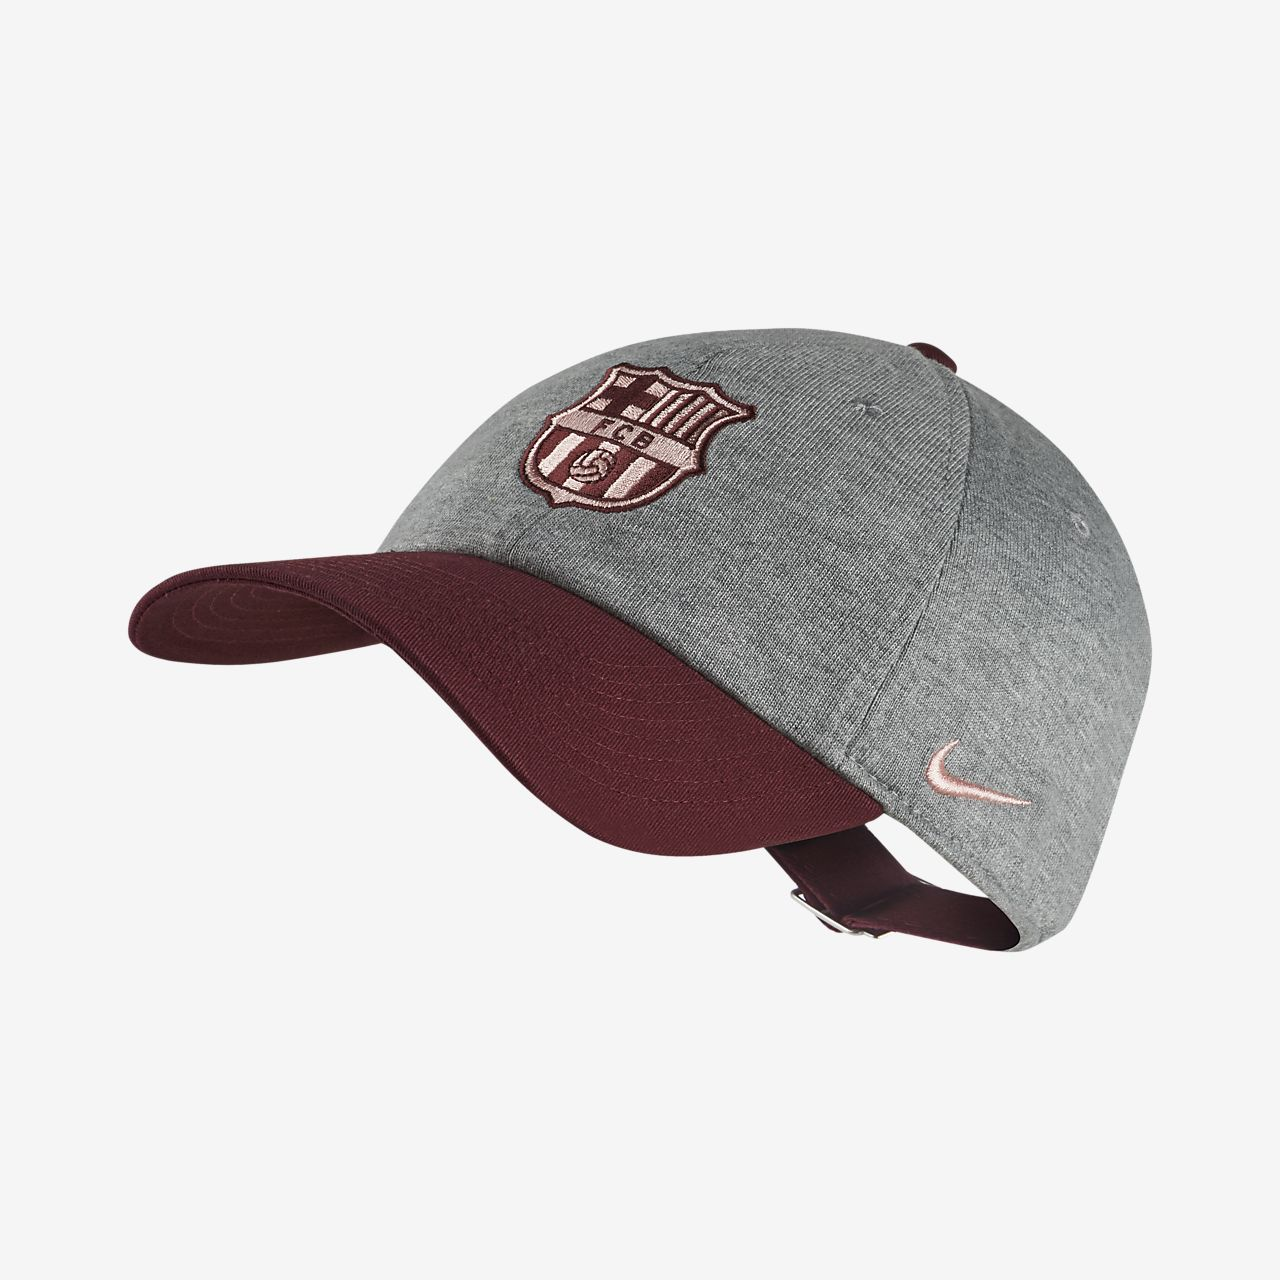 2a351b34073 FC Barcelona H86 Adjustable Hat. Nike.com AU